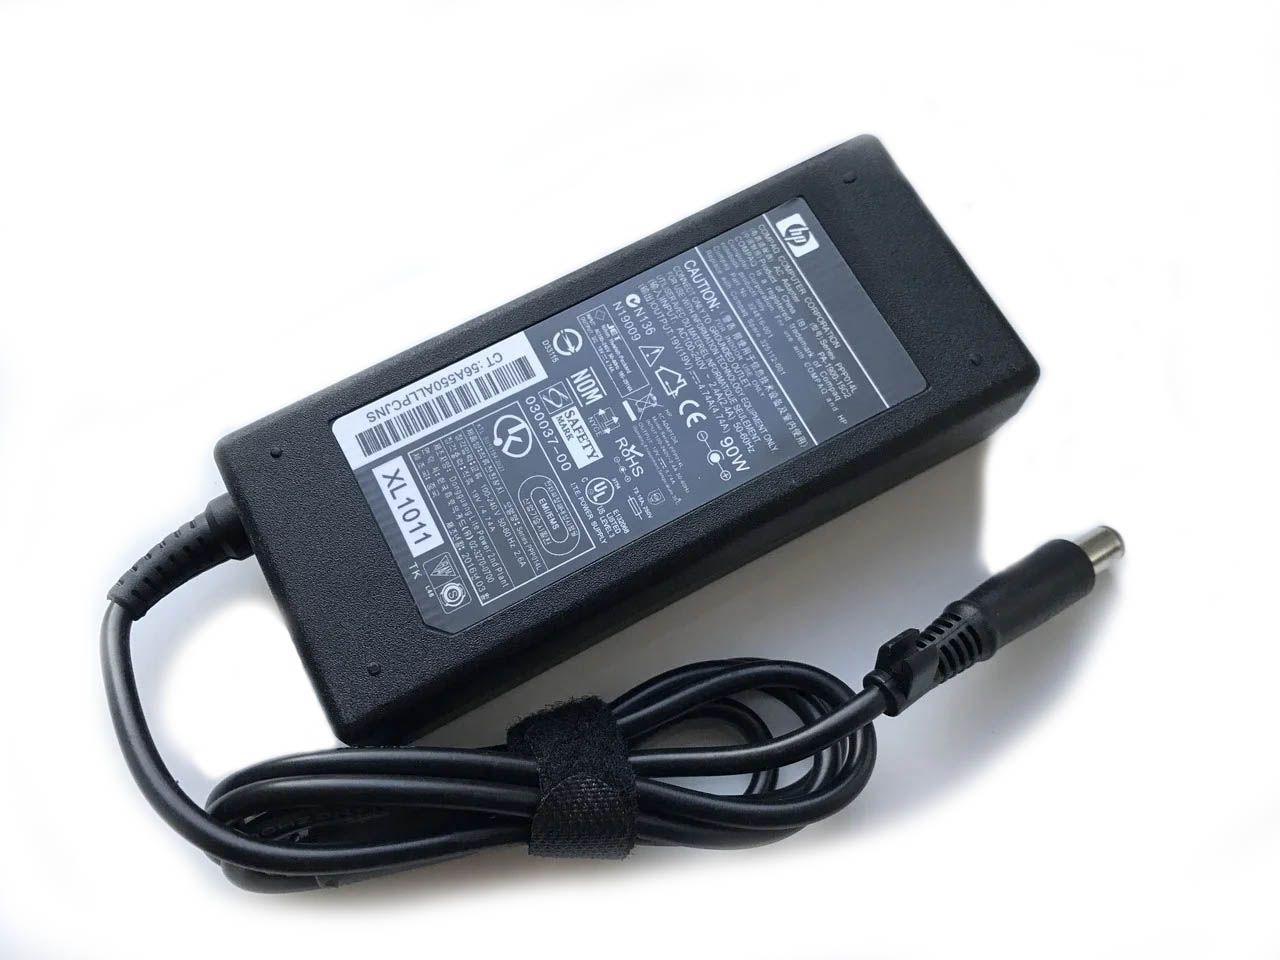 Блок питания для ноутбука HP 19V 4.74A 90W (7.4x5.0) HP90F7450 PowerPlant